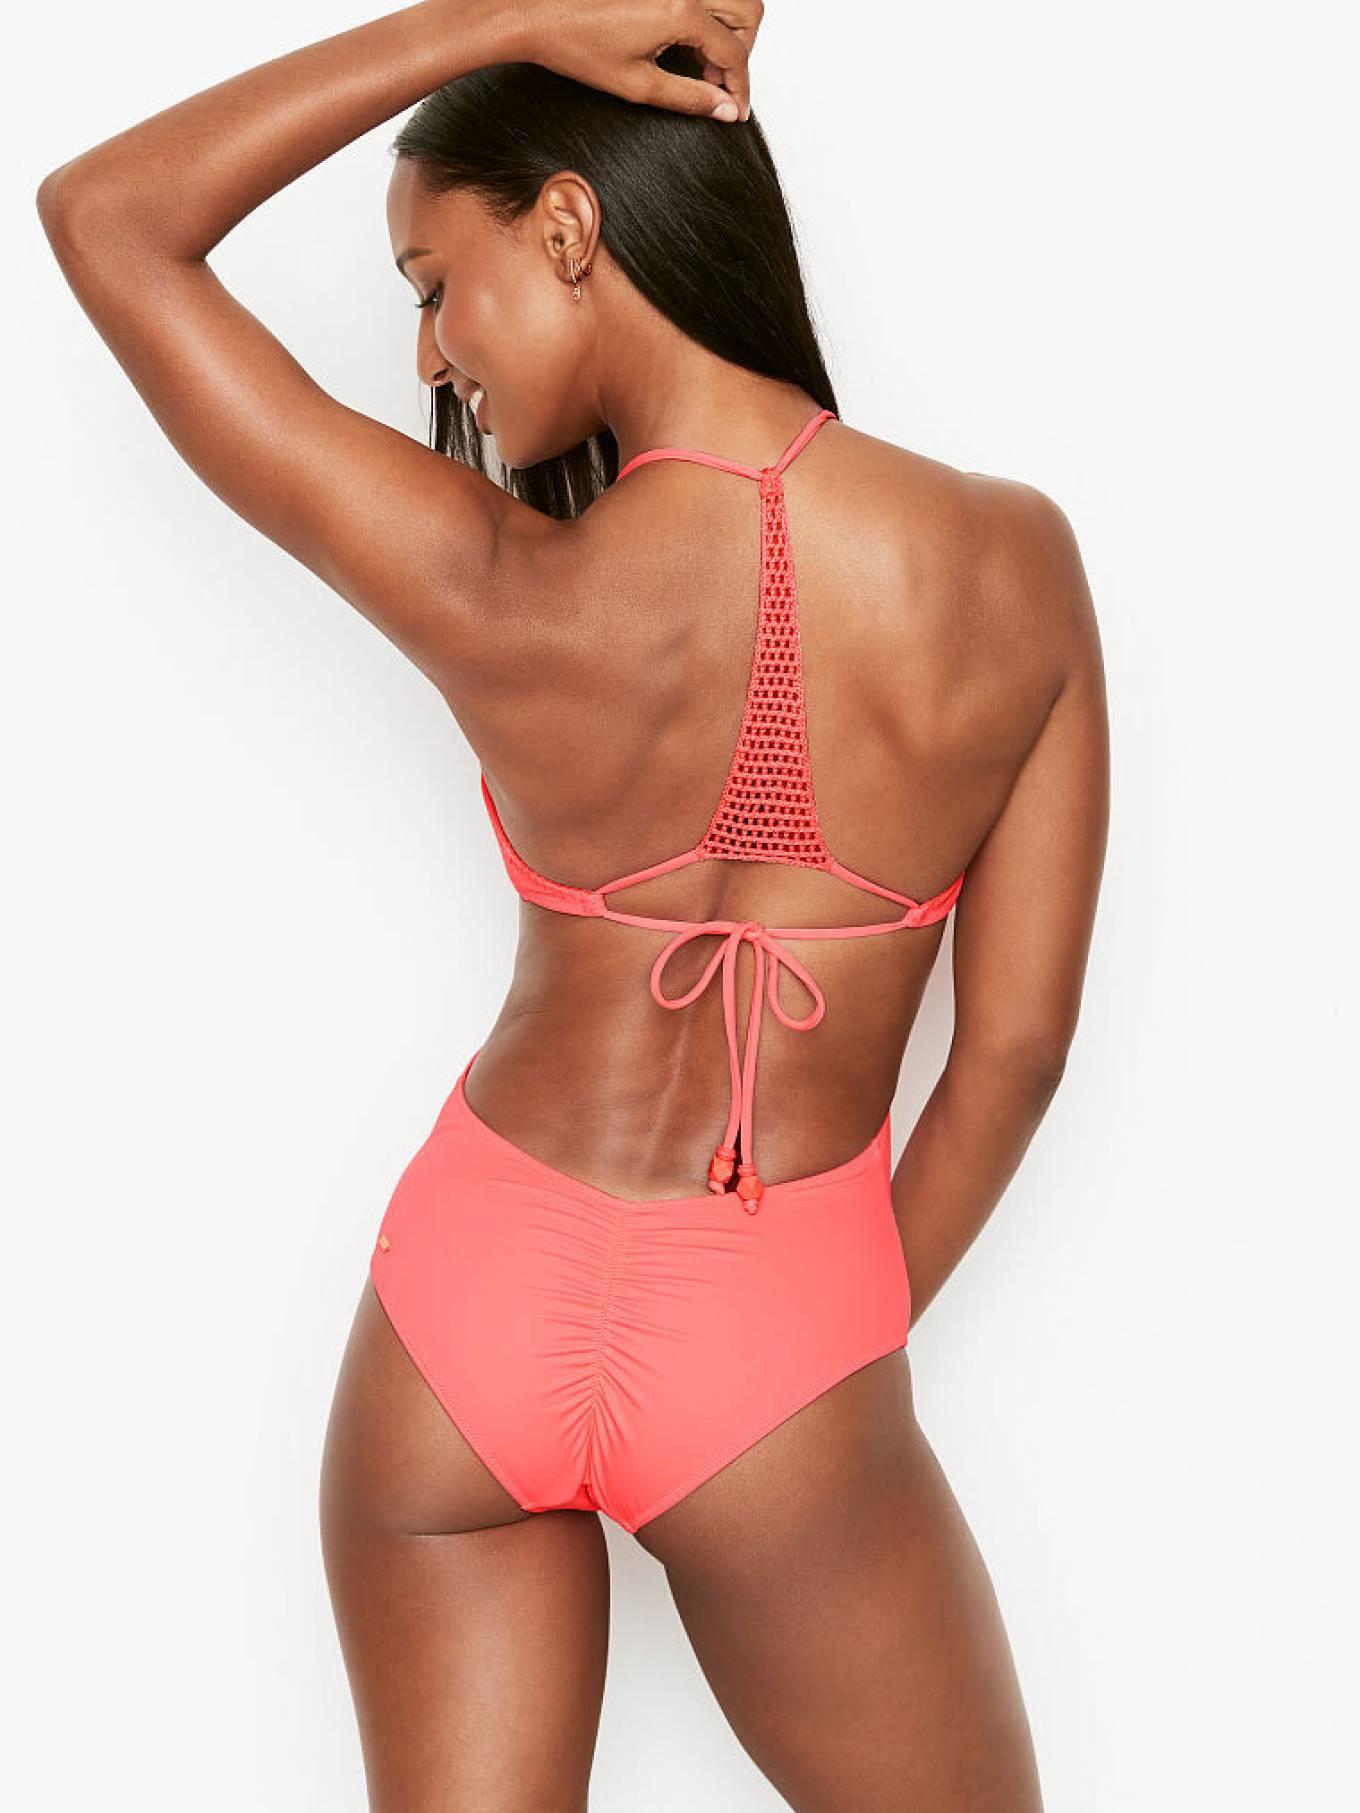 Jasmine Tookes 2020 : Jasmine Tookes – Victorias Secret collection – November 2020-23